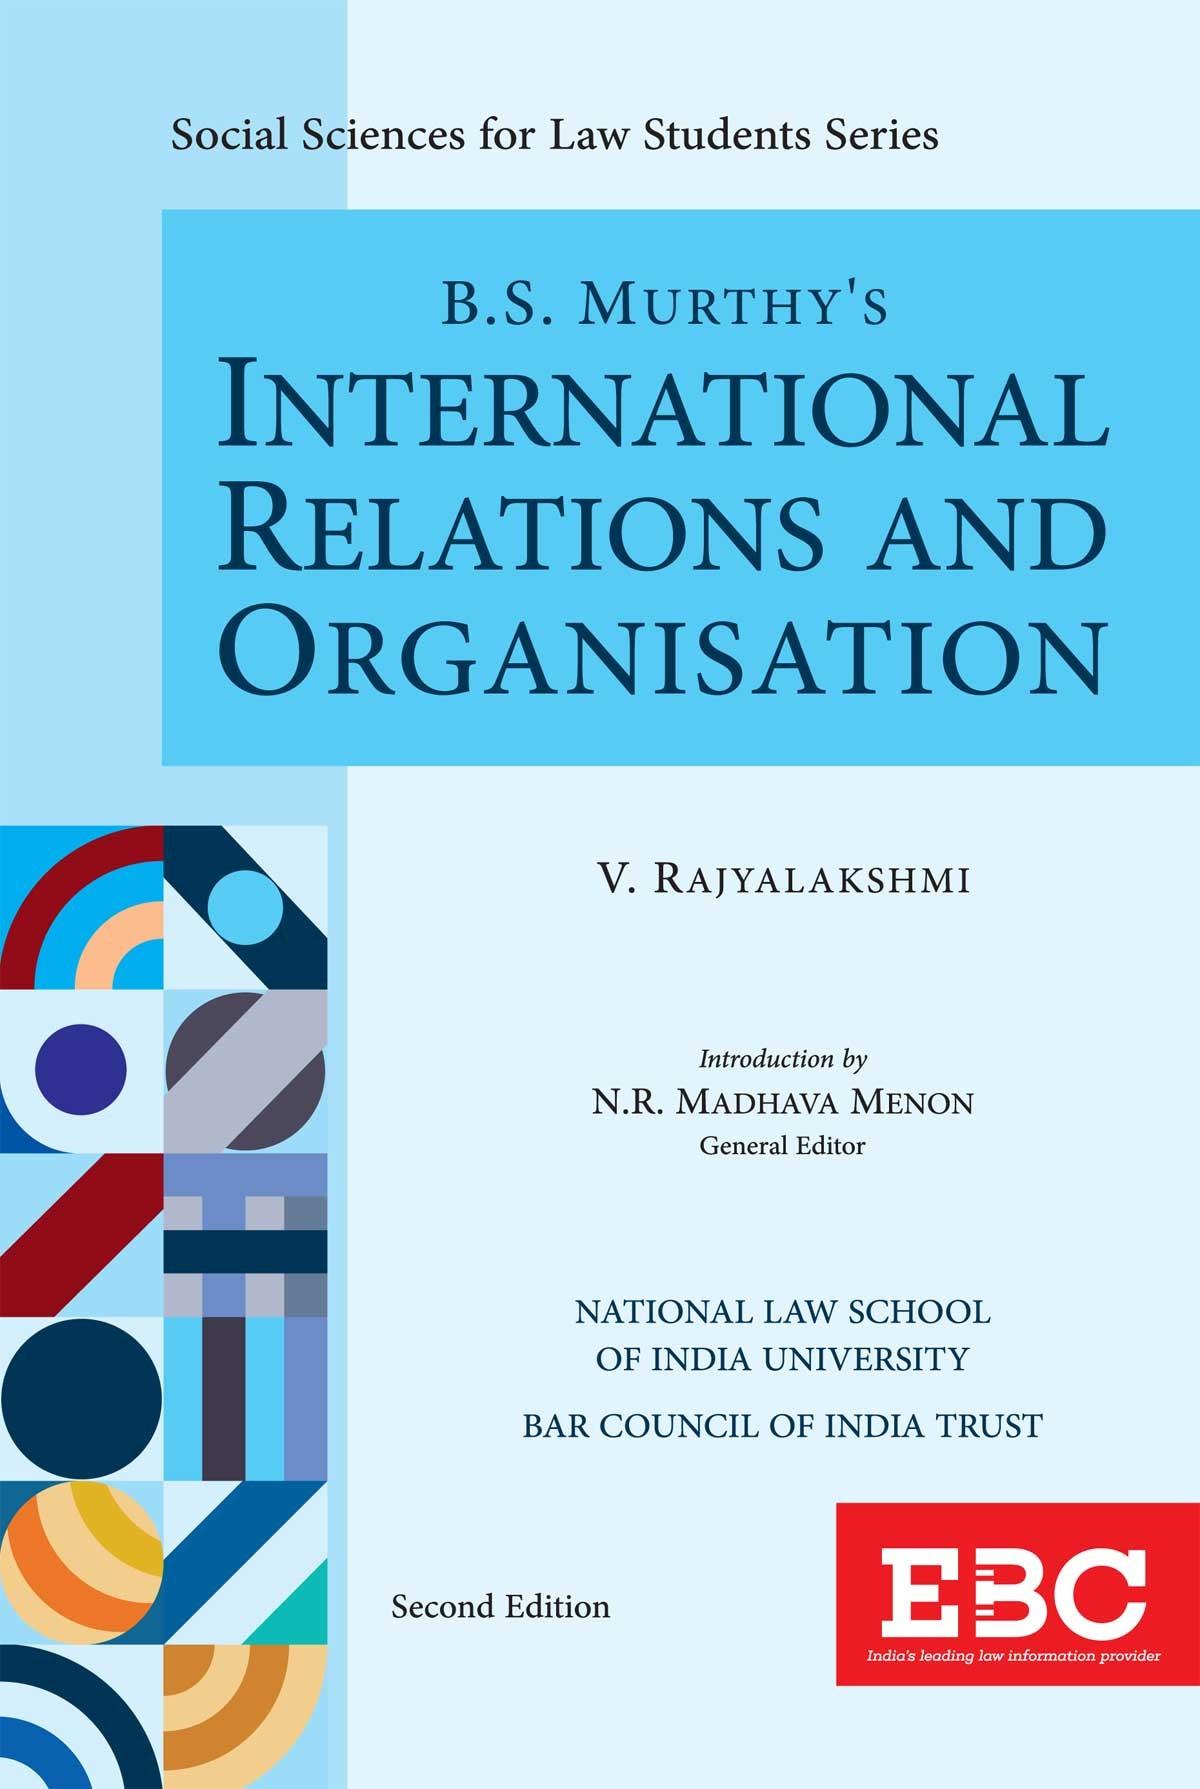 B.S. Murthy's International Relations and Organisation